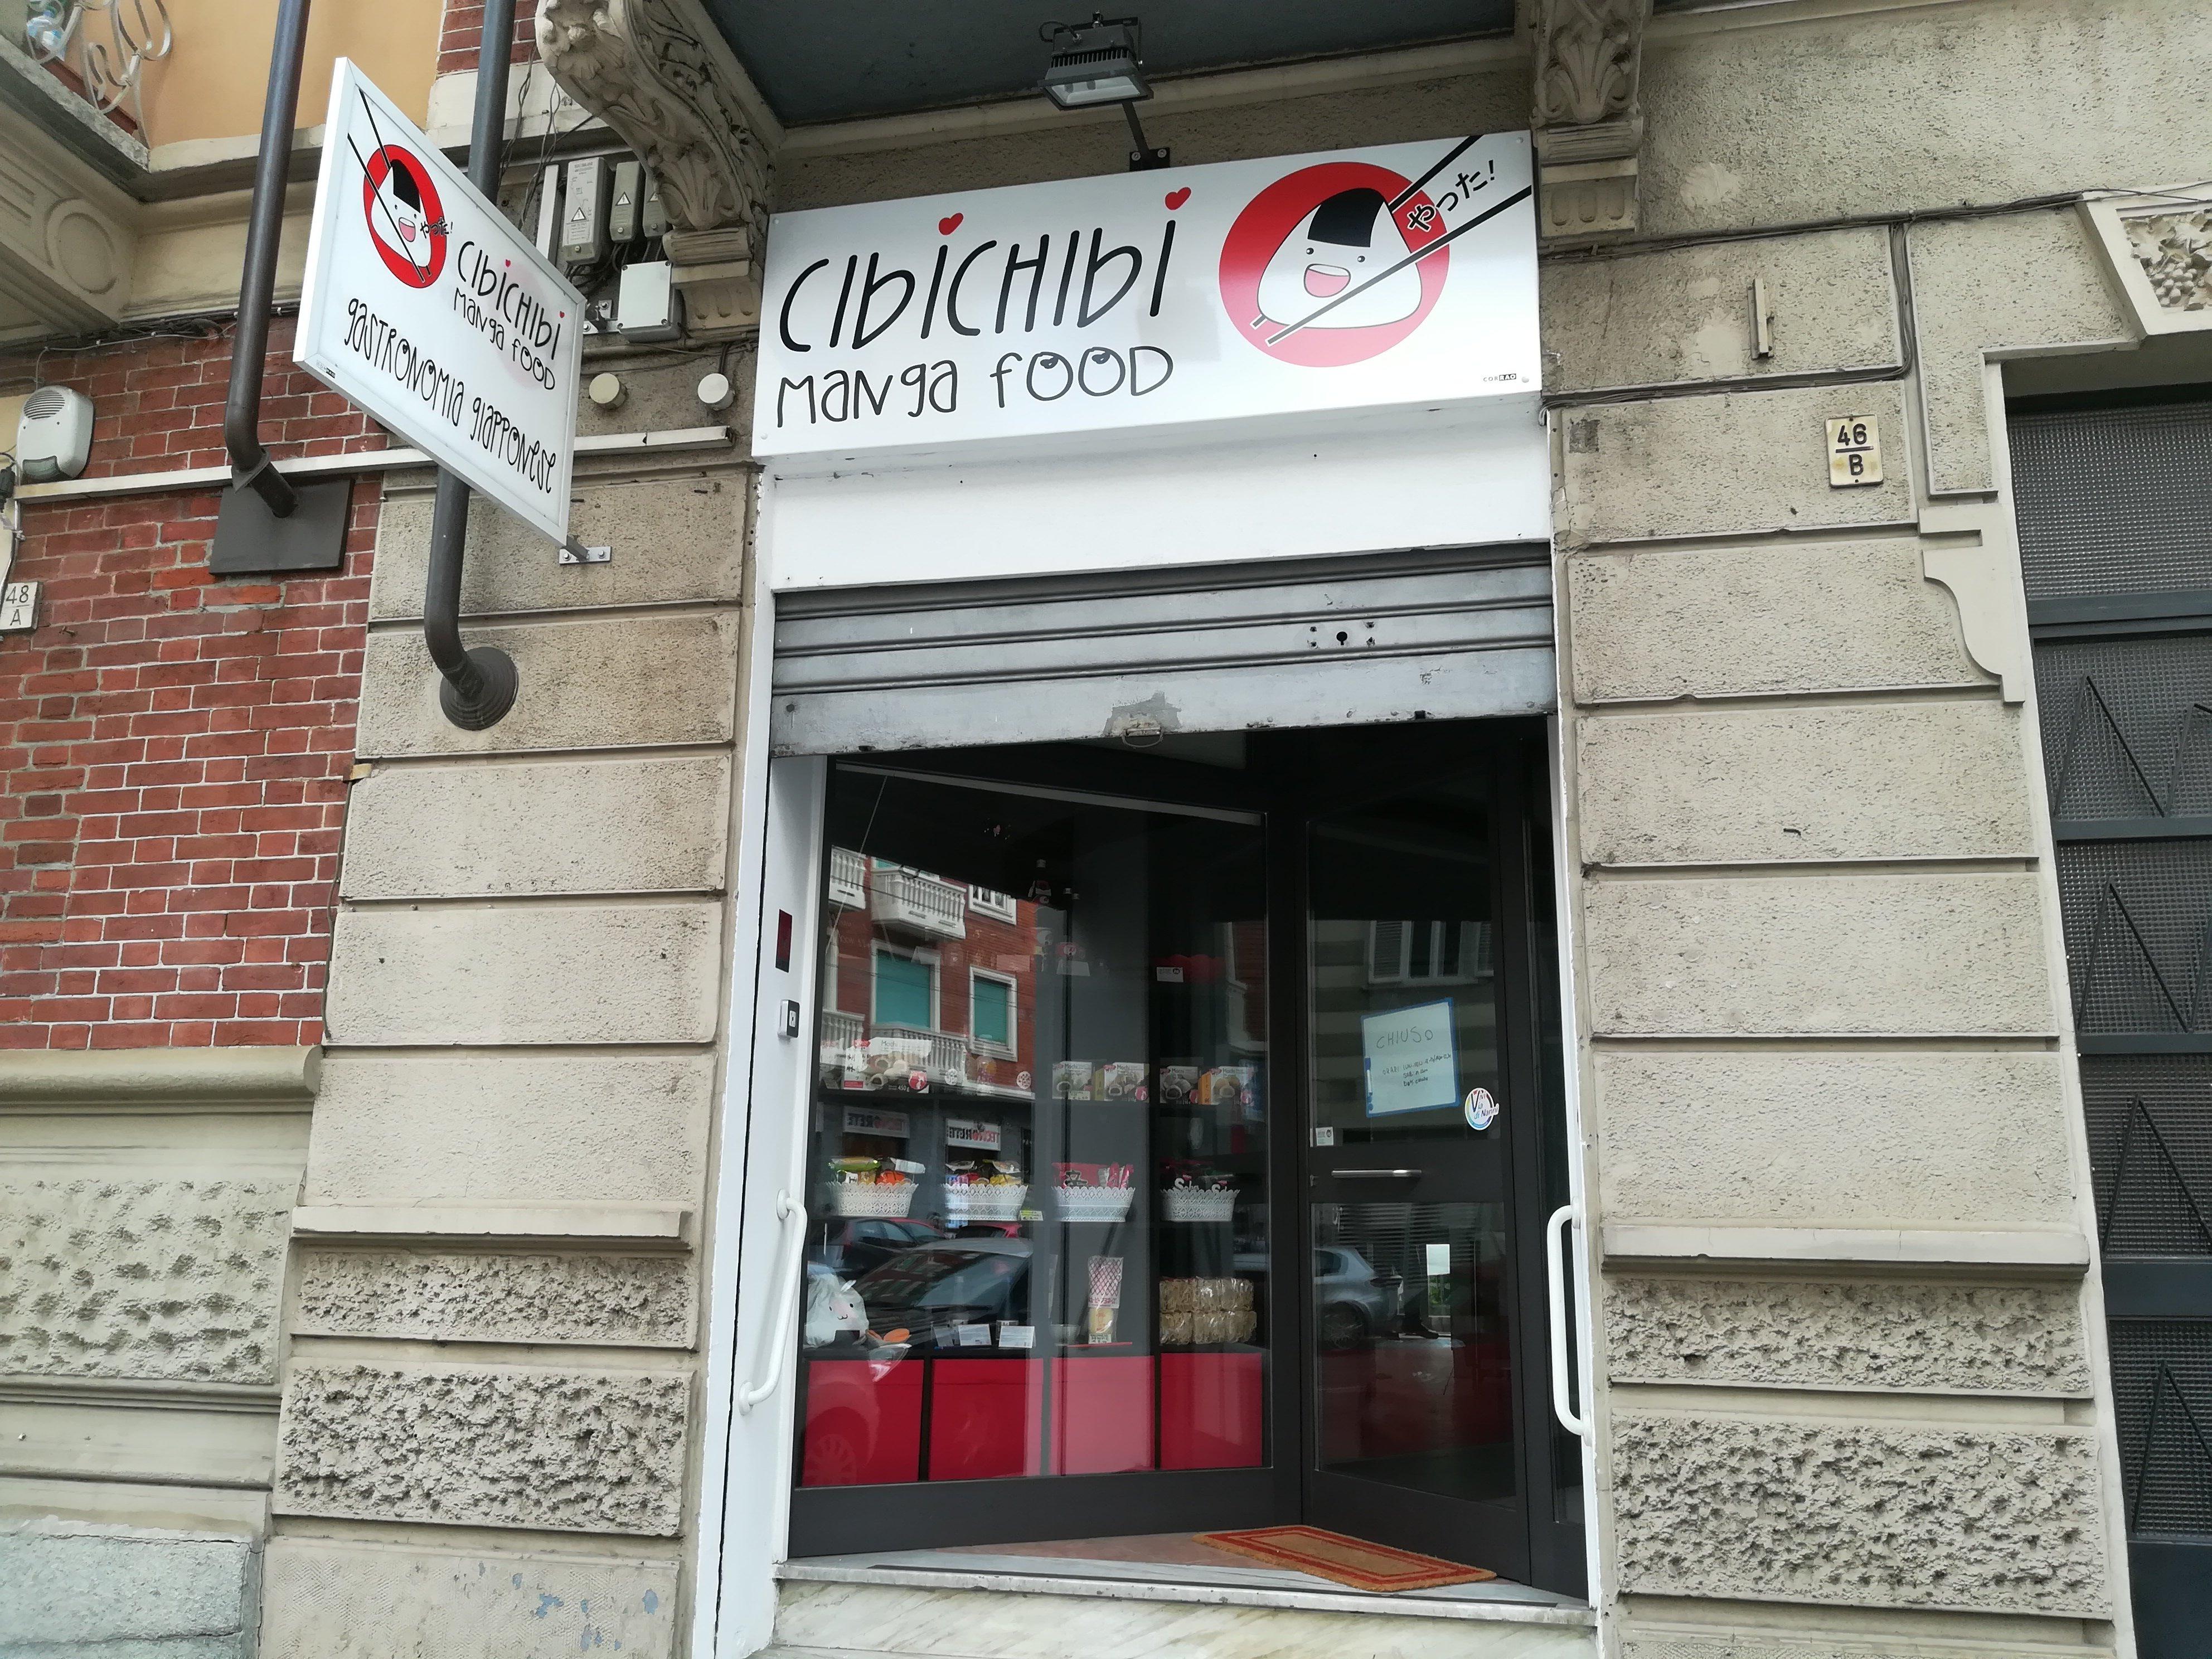 Cibichibi Manga Food, Torino